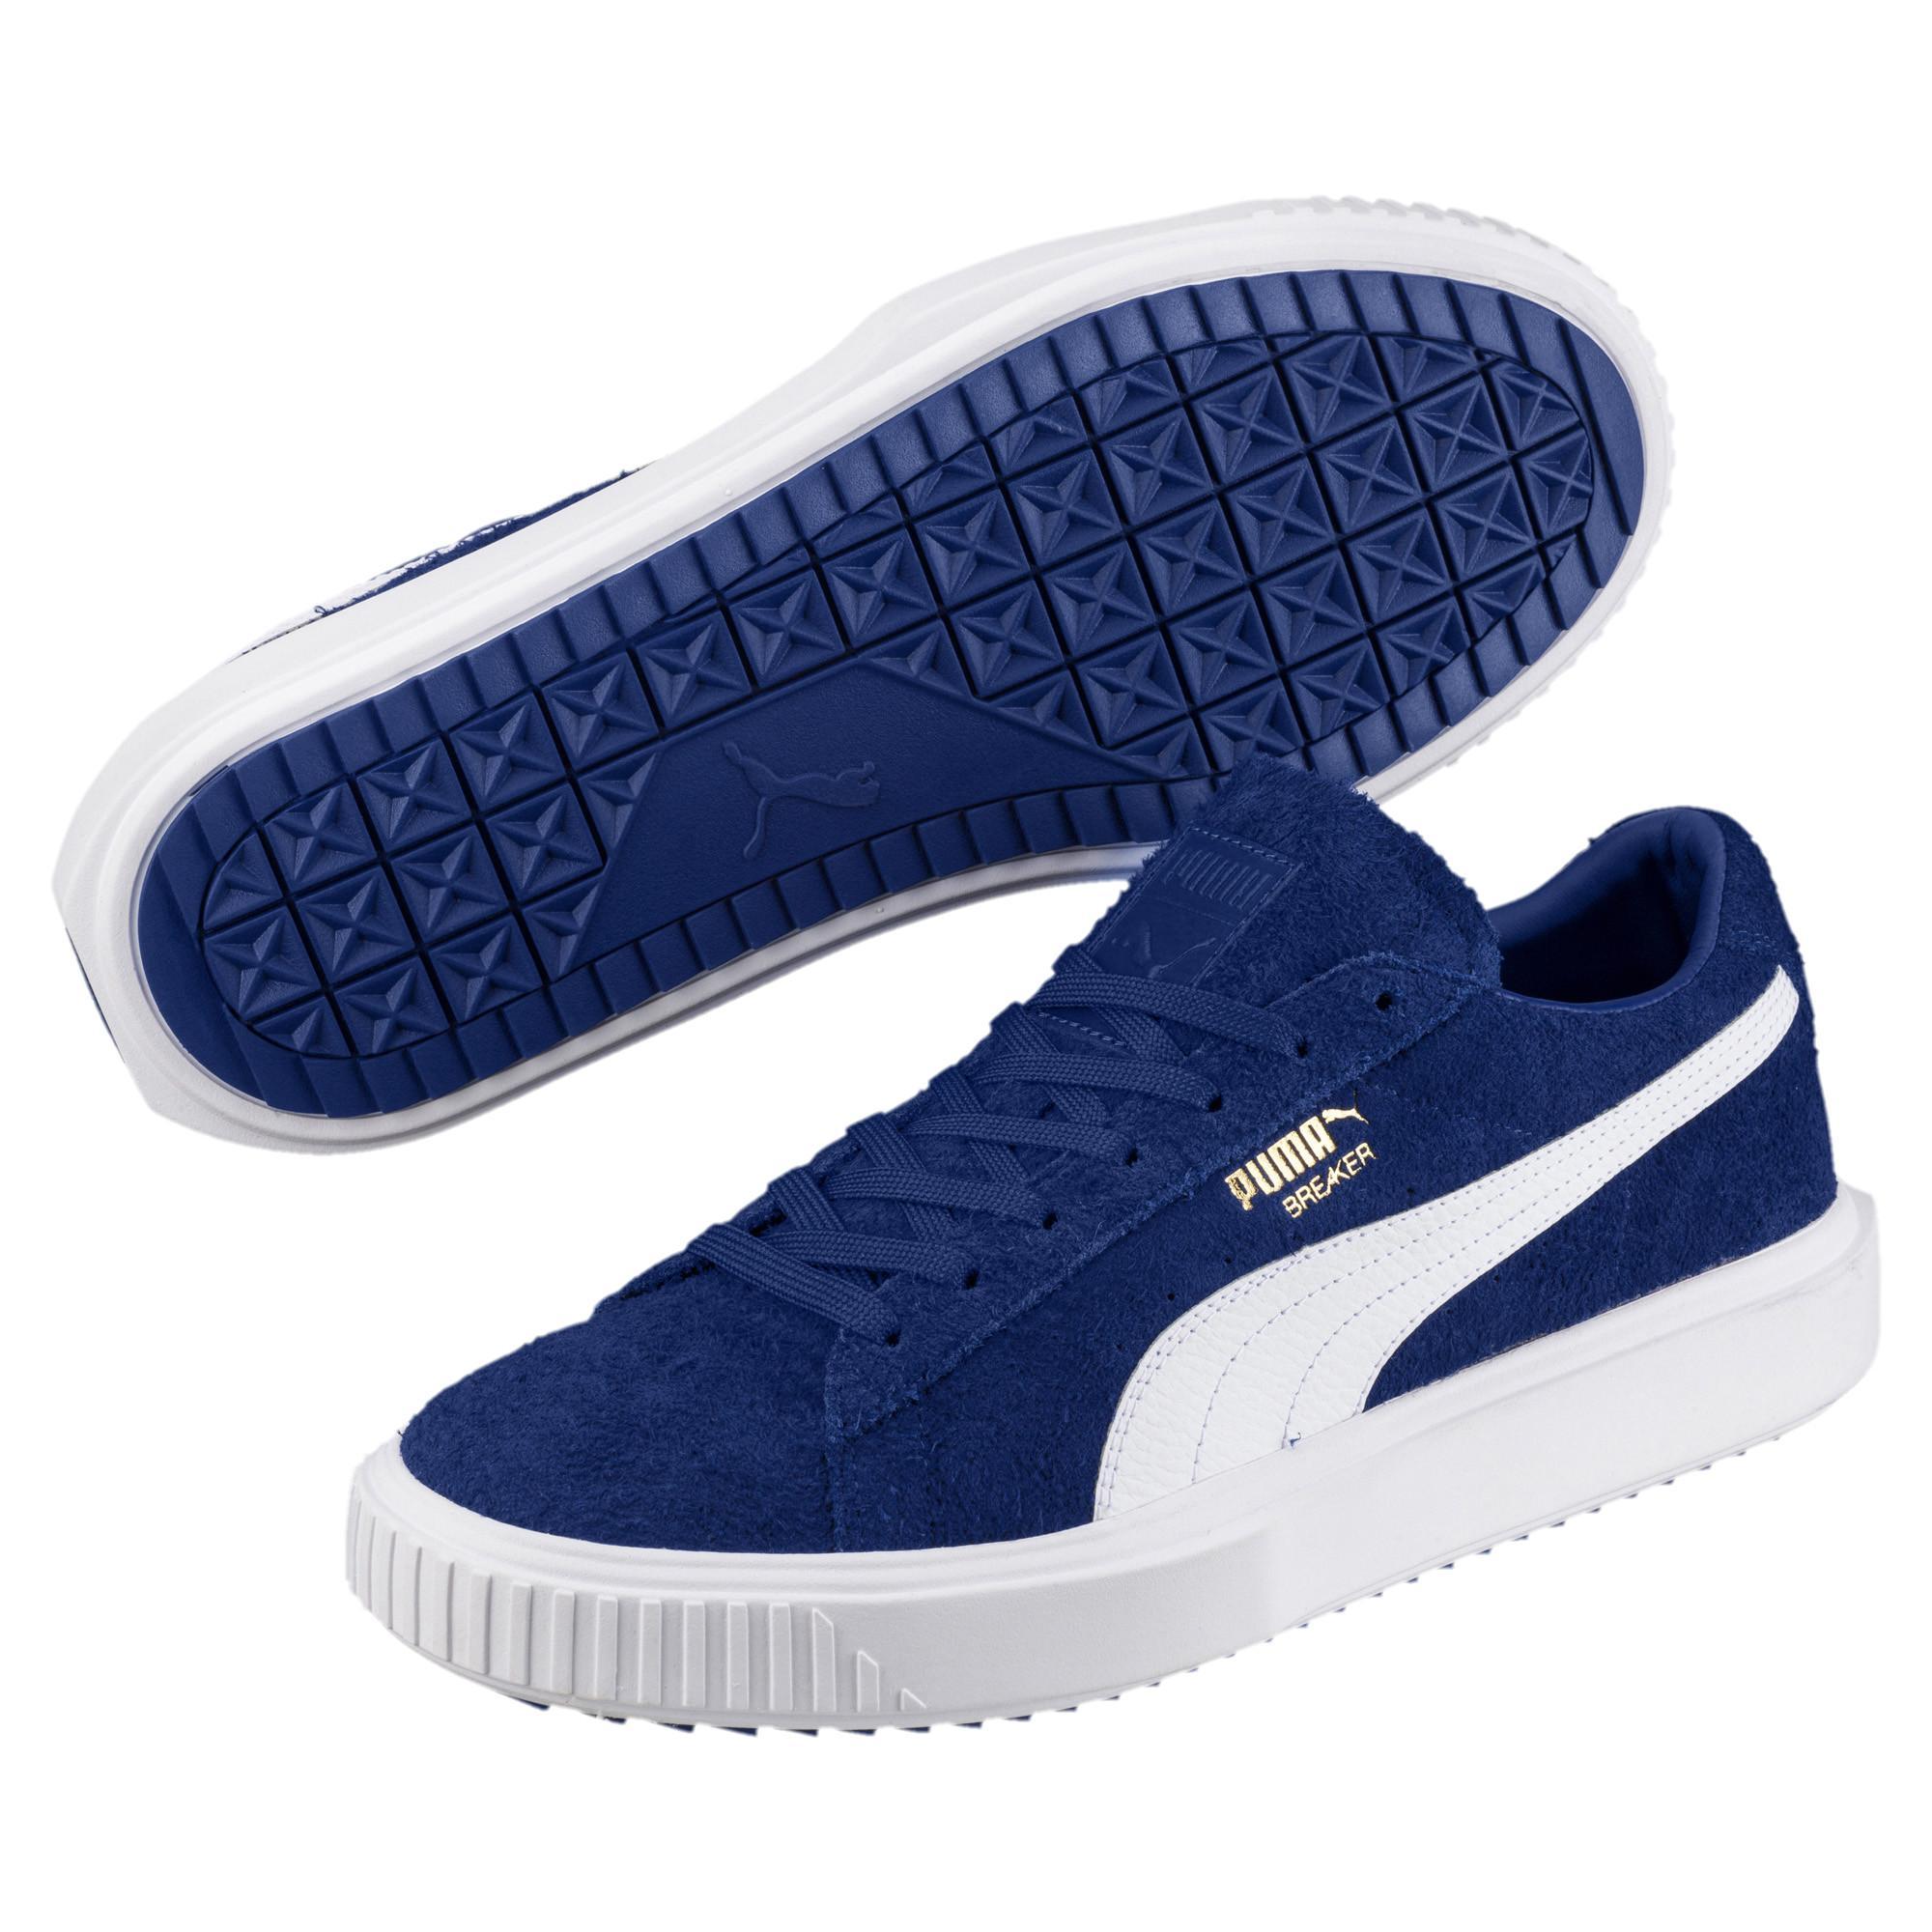 PUMA Suede Breaker Evolution Sneakers